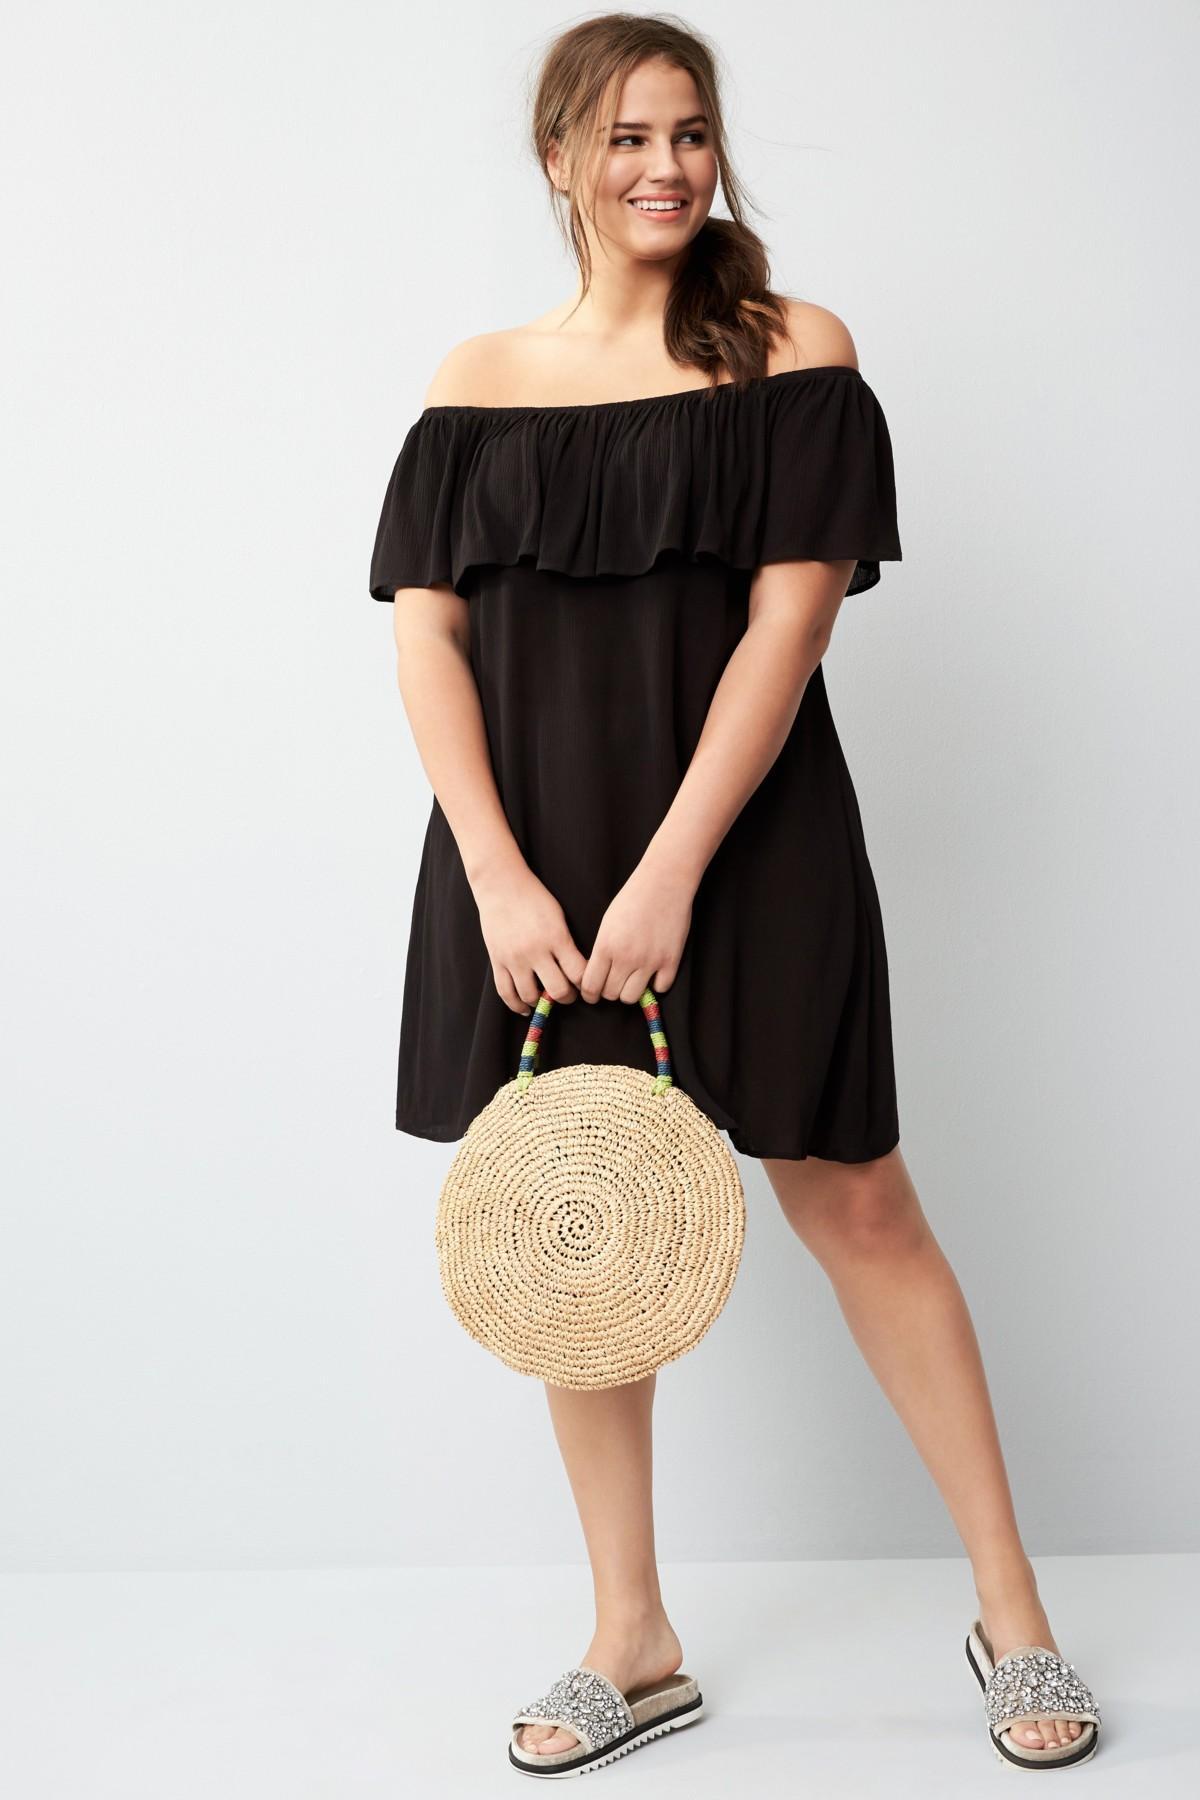 Becca Black Southern Belle Off-the-shoulder Cover-up Dress (plus Size)